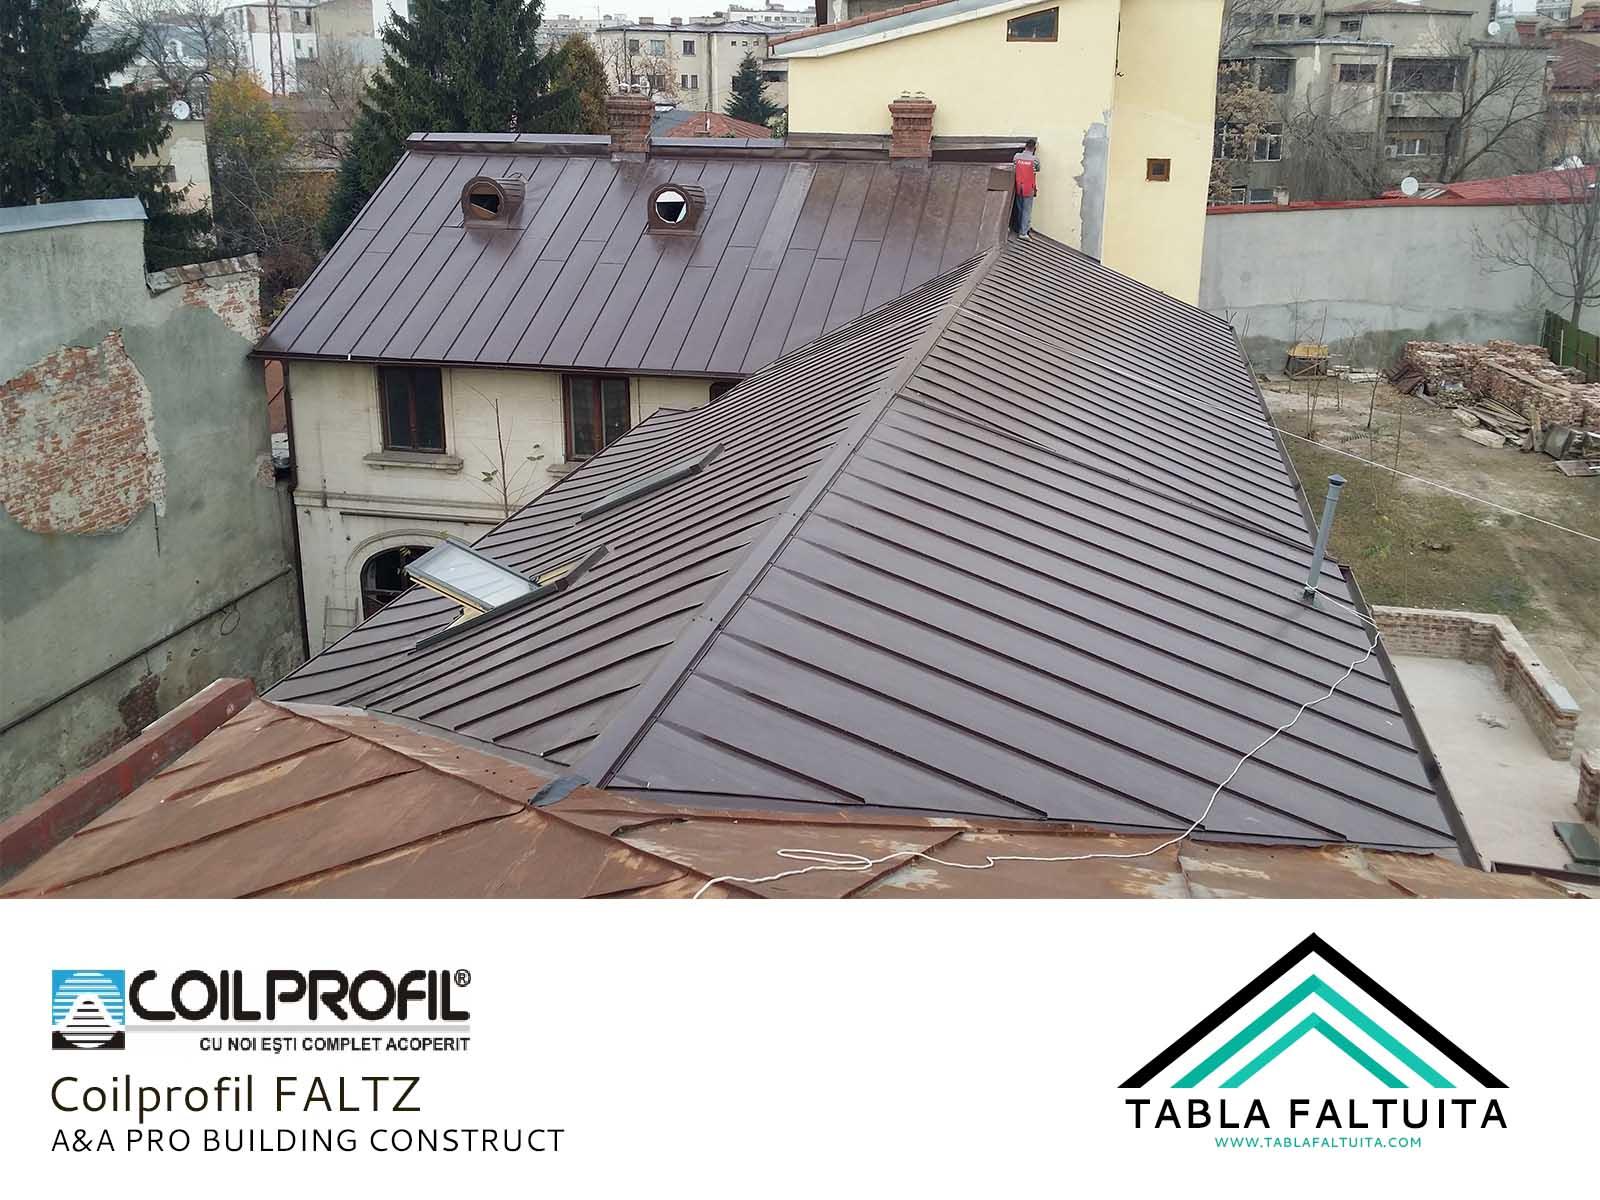 Coilprofil FALTZ 3